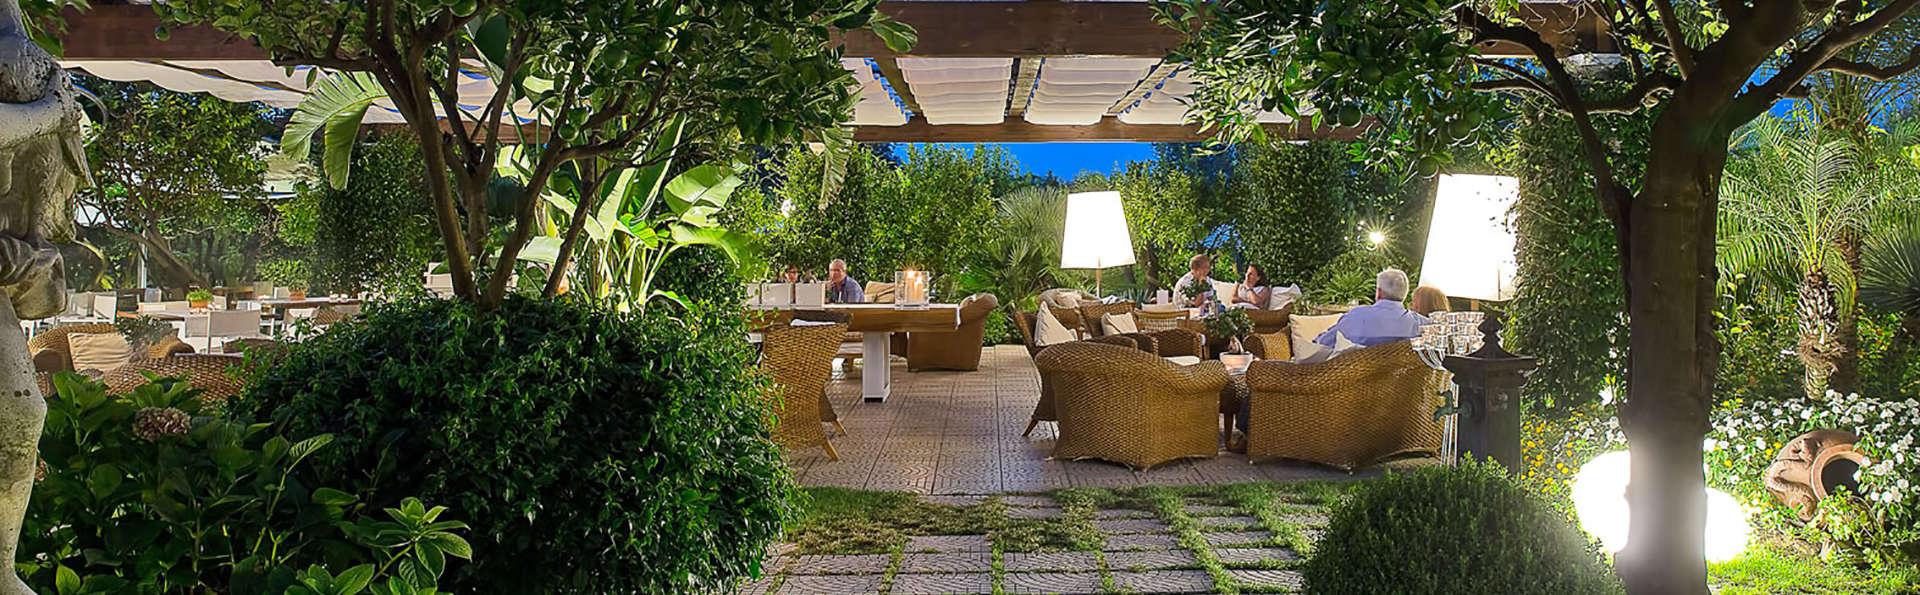 La Medusa Hotel & Boutique Spa - edit_terras.jpg